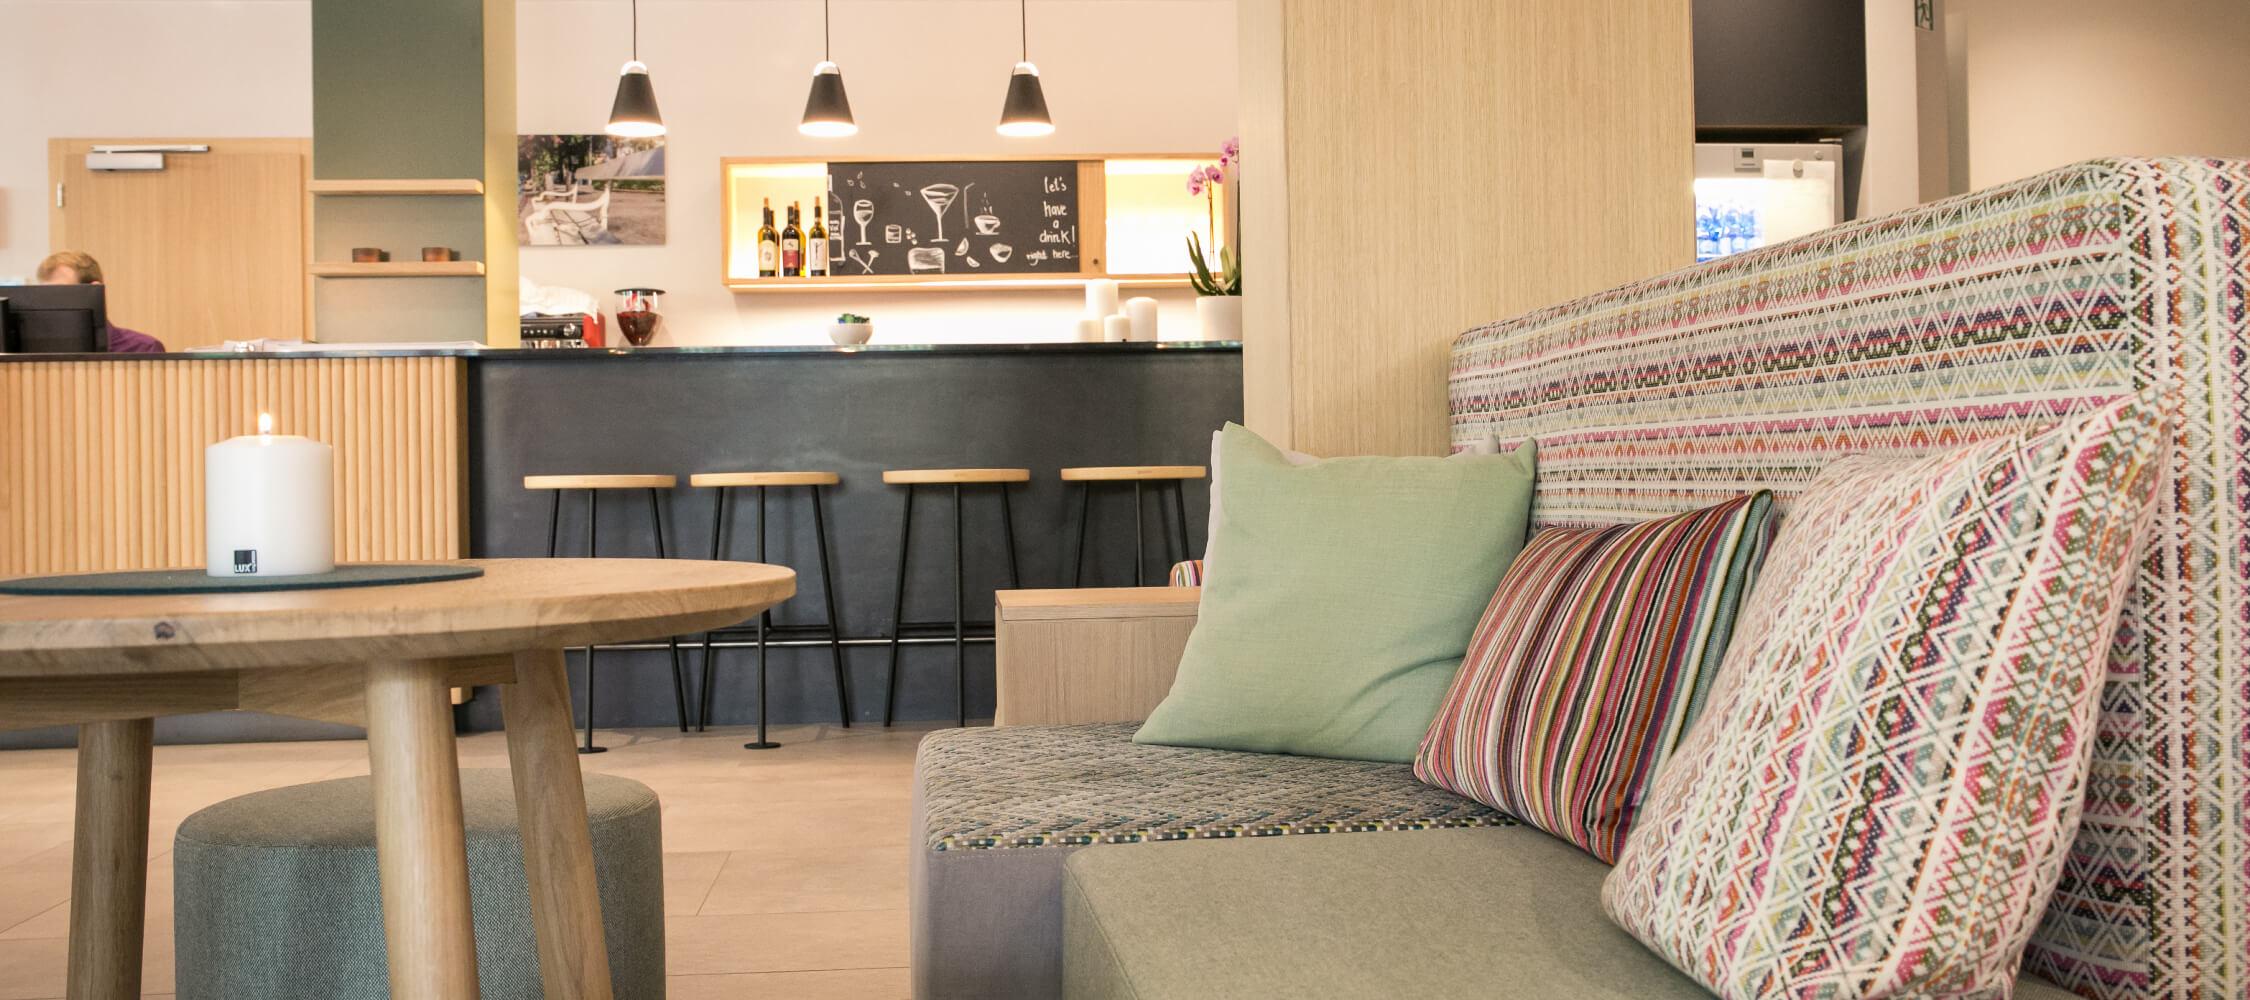 Hotel_Flora_Merano_Bar_Detail_Anguane_2018-6334_2250x1000